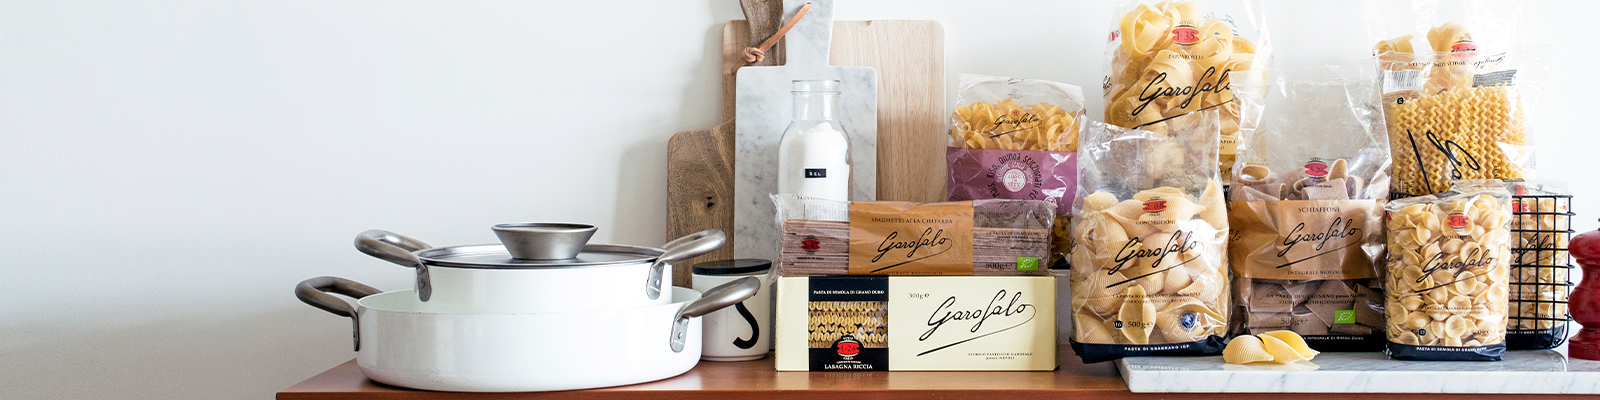 Pasta Garofalo - Productos